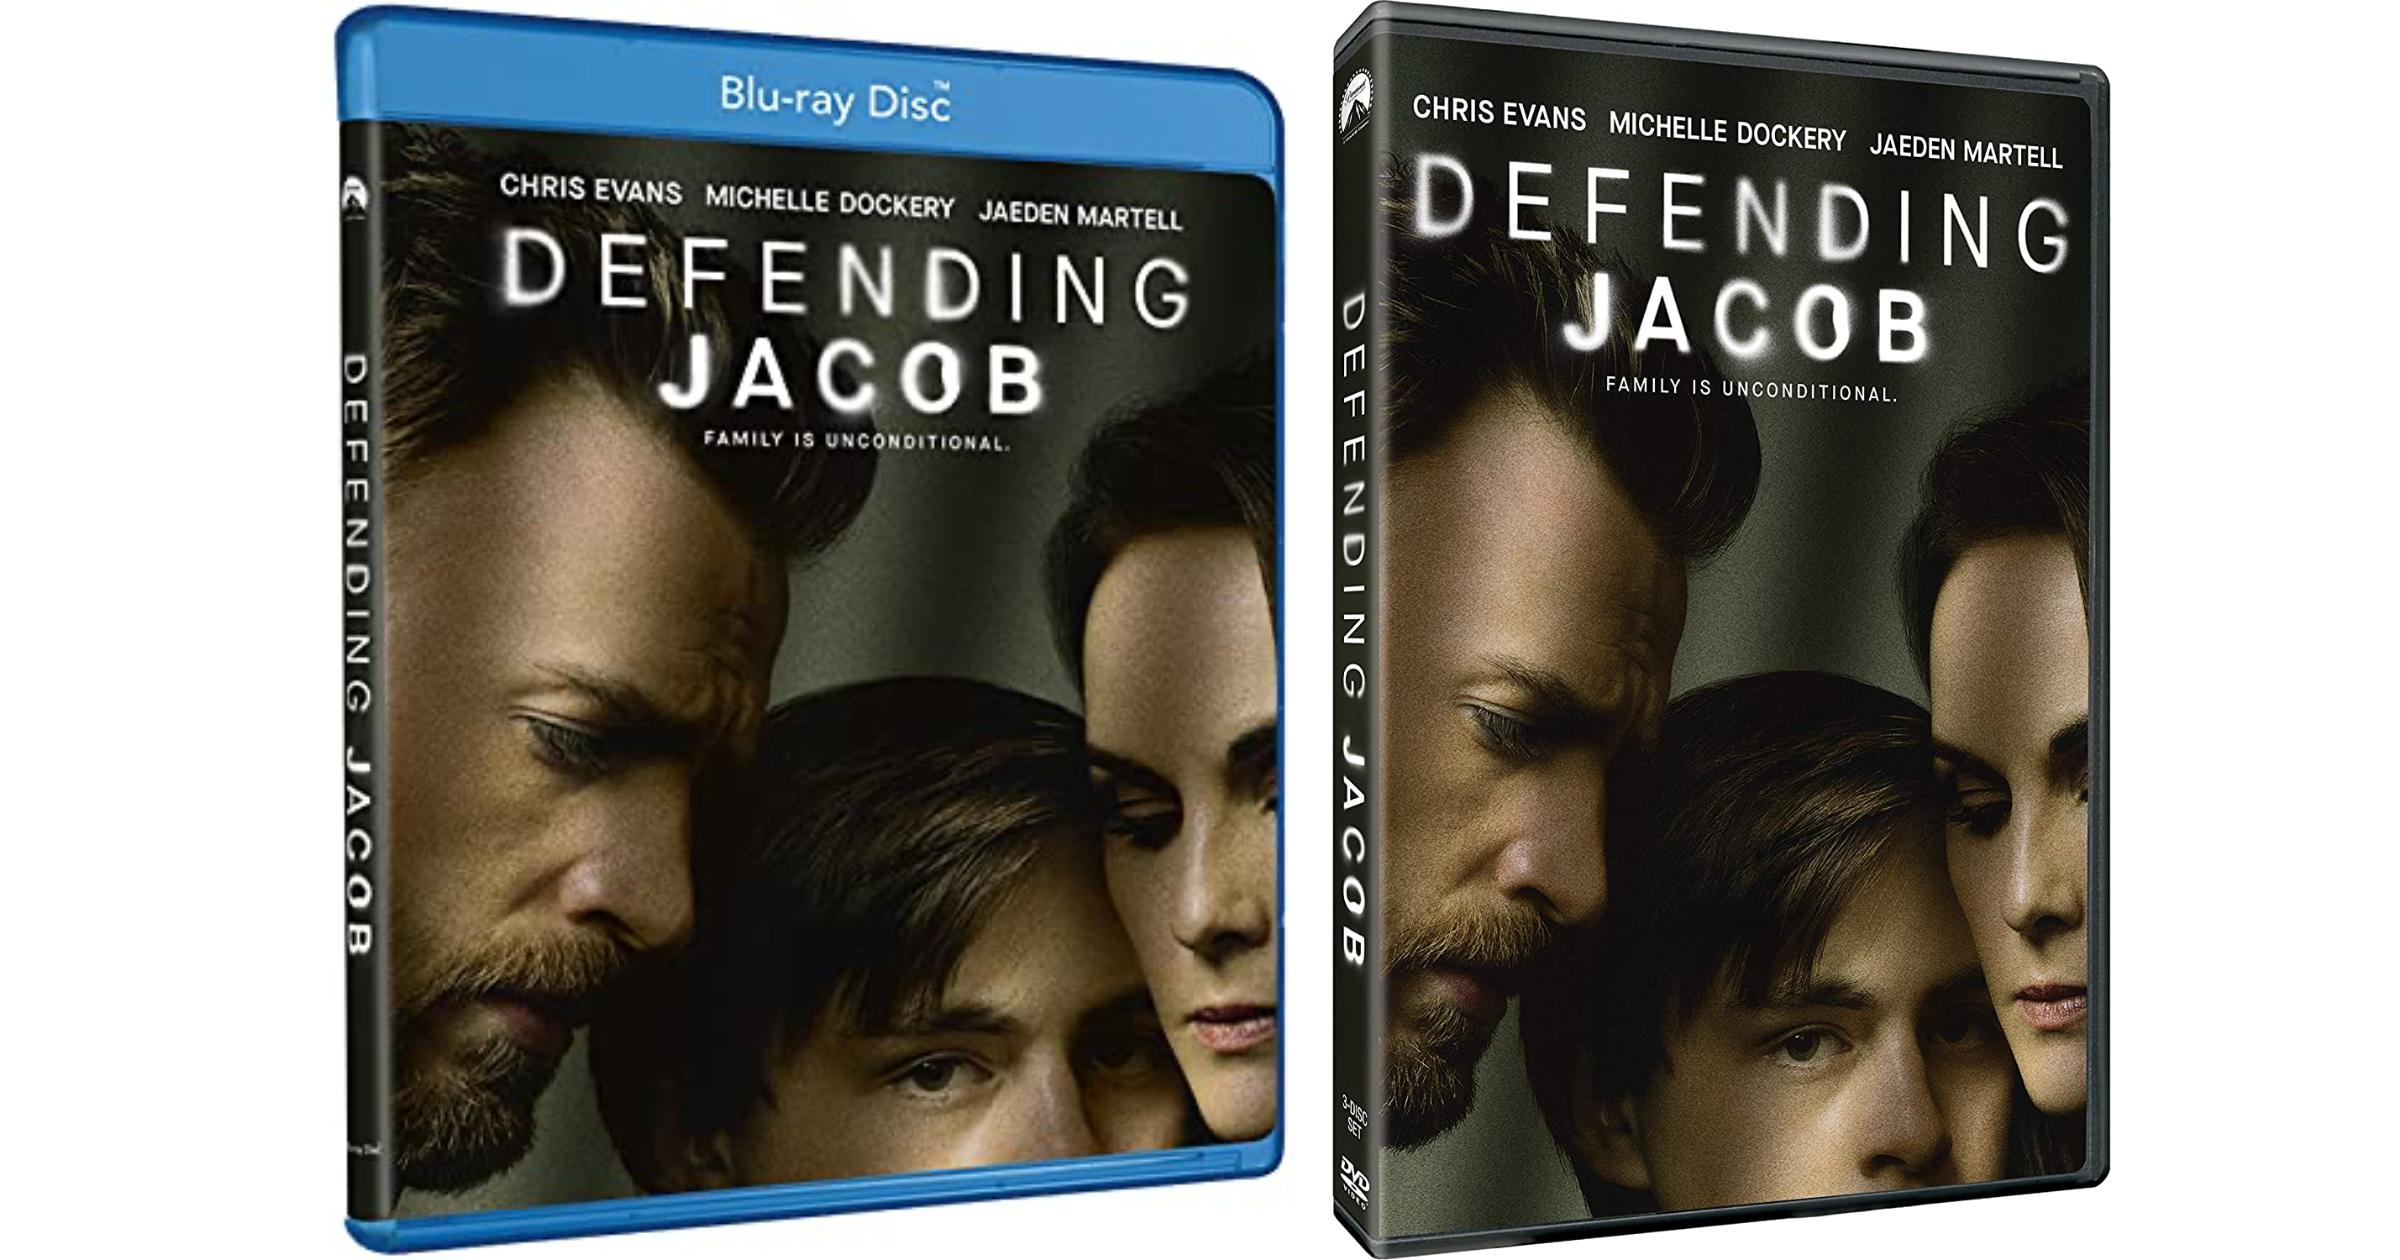 Defending Jacob Blu-ray DVD